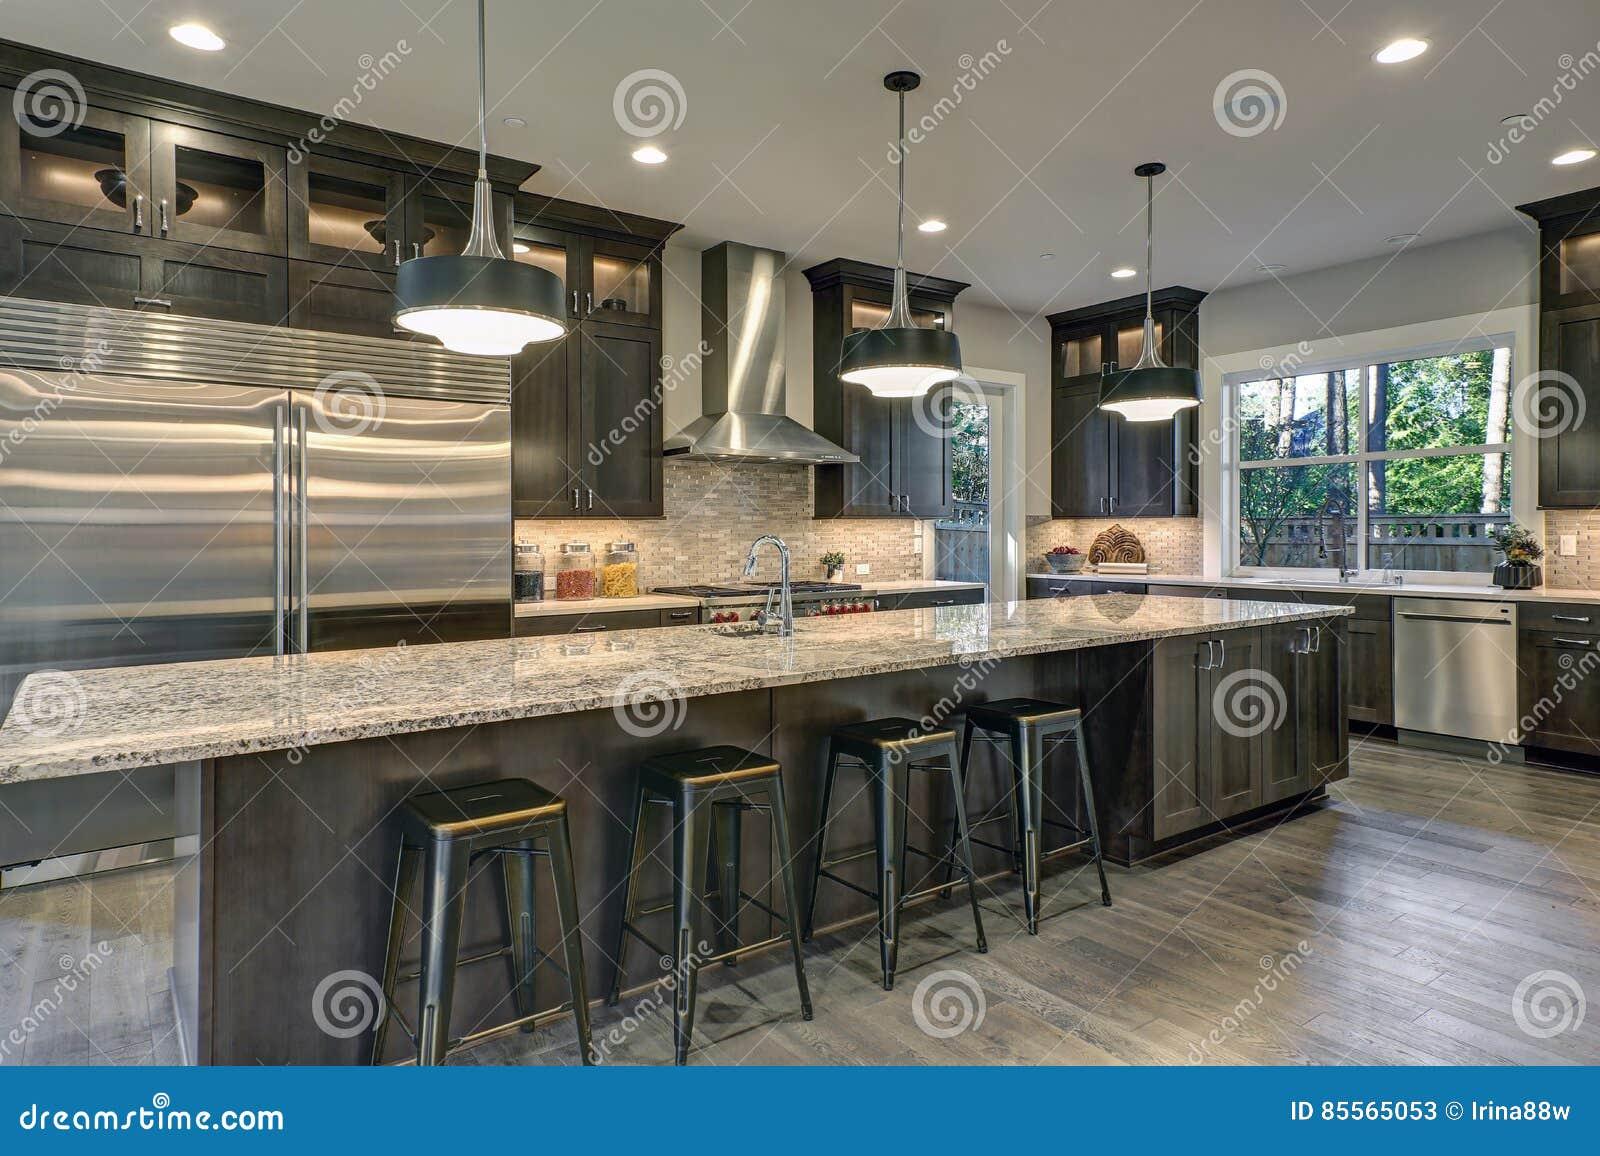 astonishing huge kitchen island   Modern Kitchen With Brown Kitchen Cabinets Stock Image ...